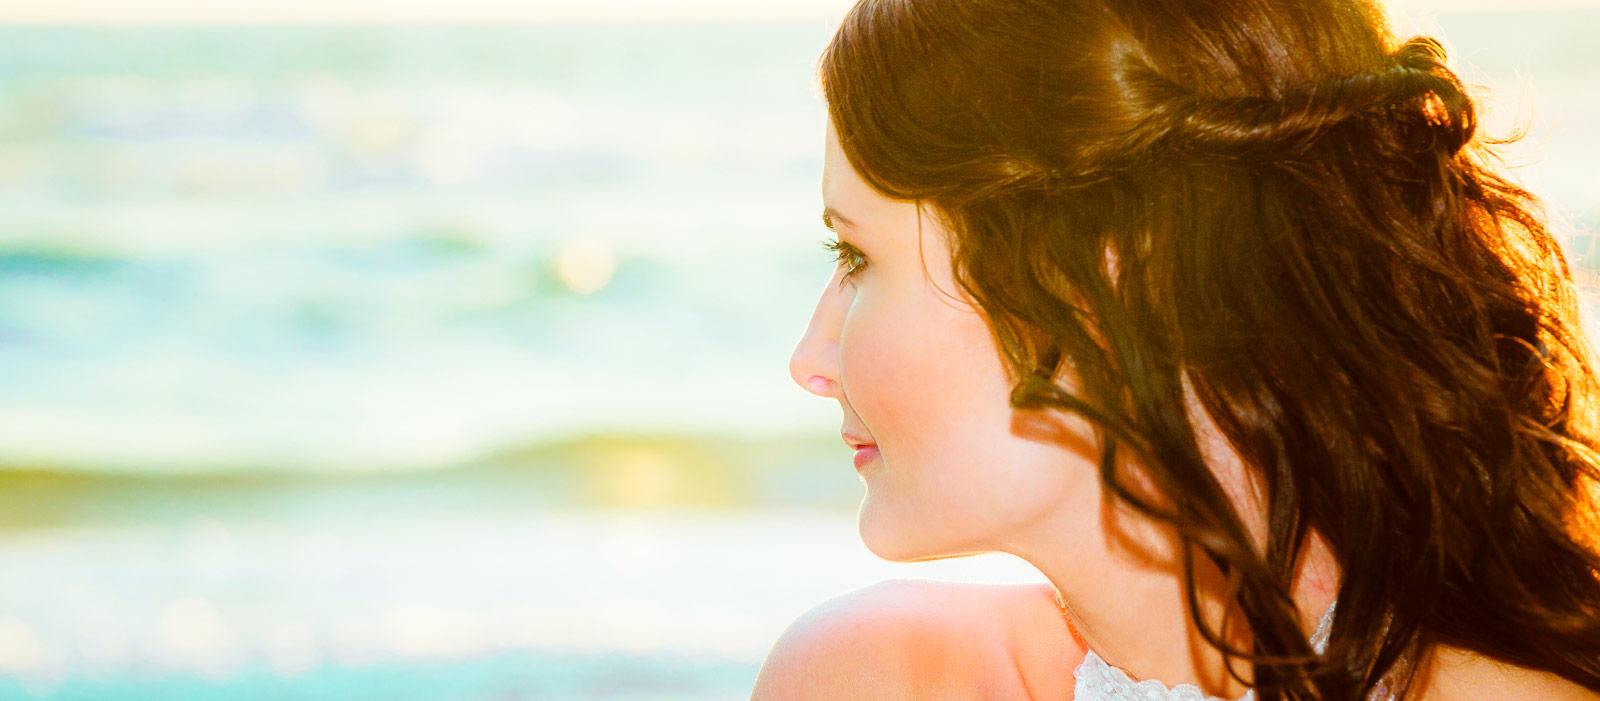 Photo of Byron Bay bride by Gold Coast wedding photographer Chris Harding